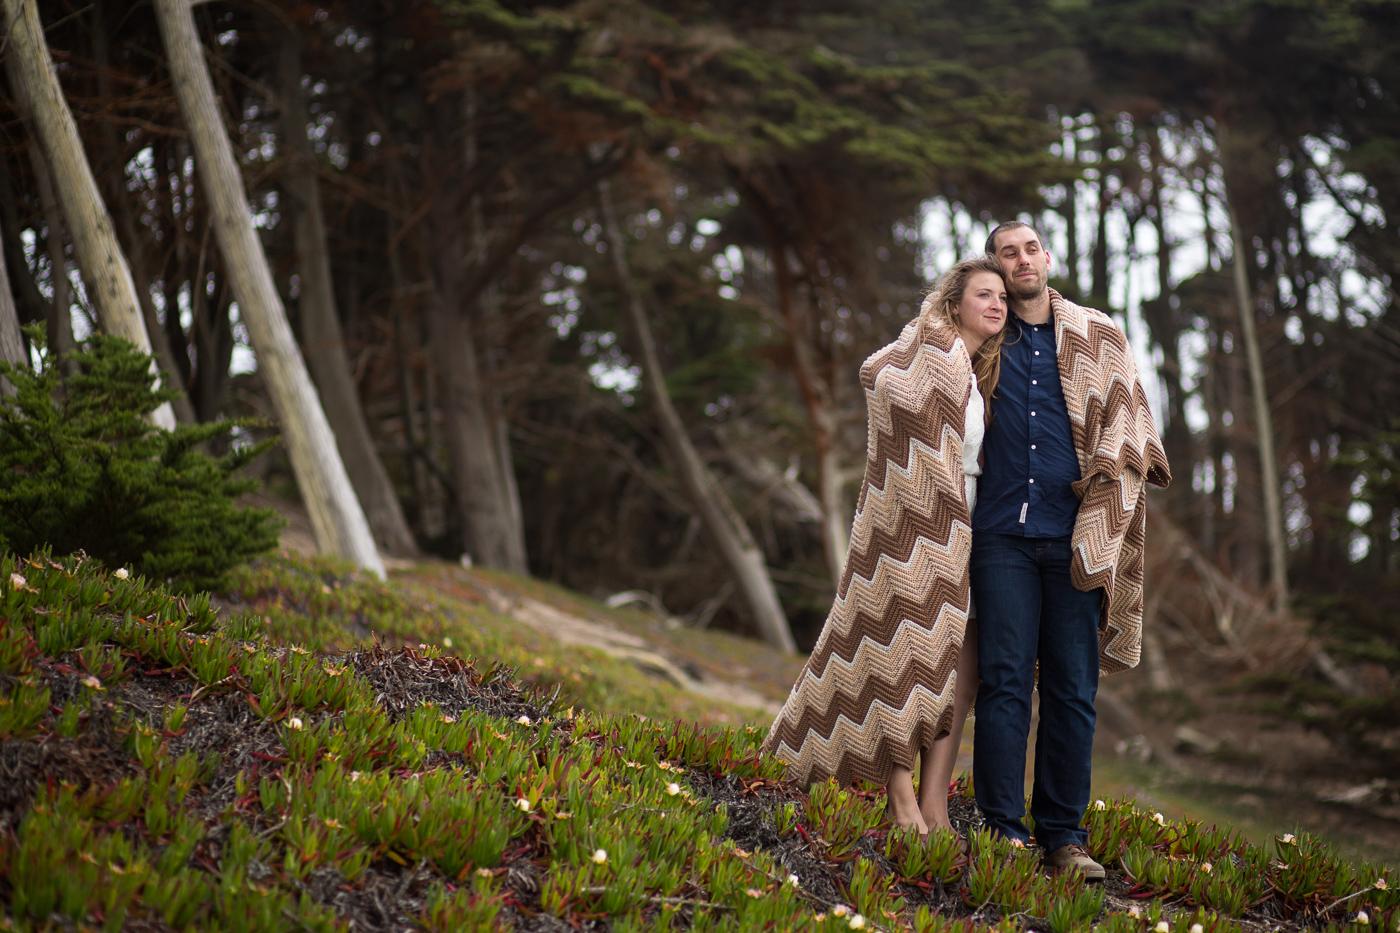 Baker-beach-san-francisco-california-engagement-session-17.jpg